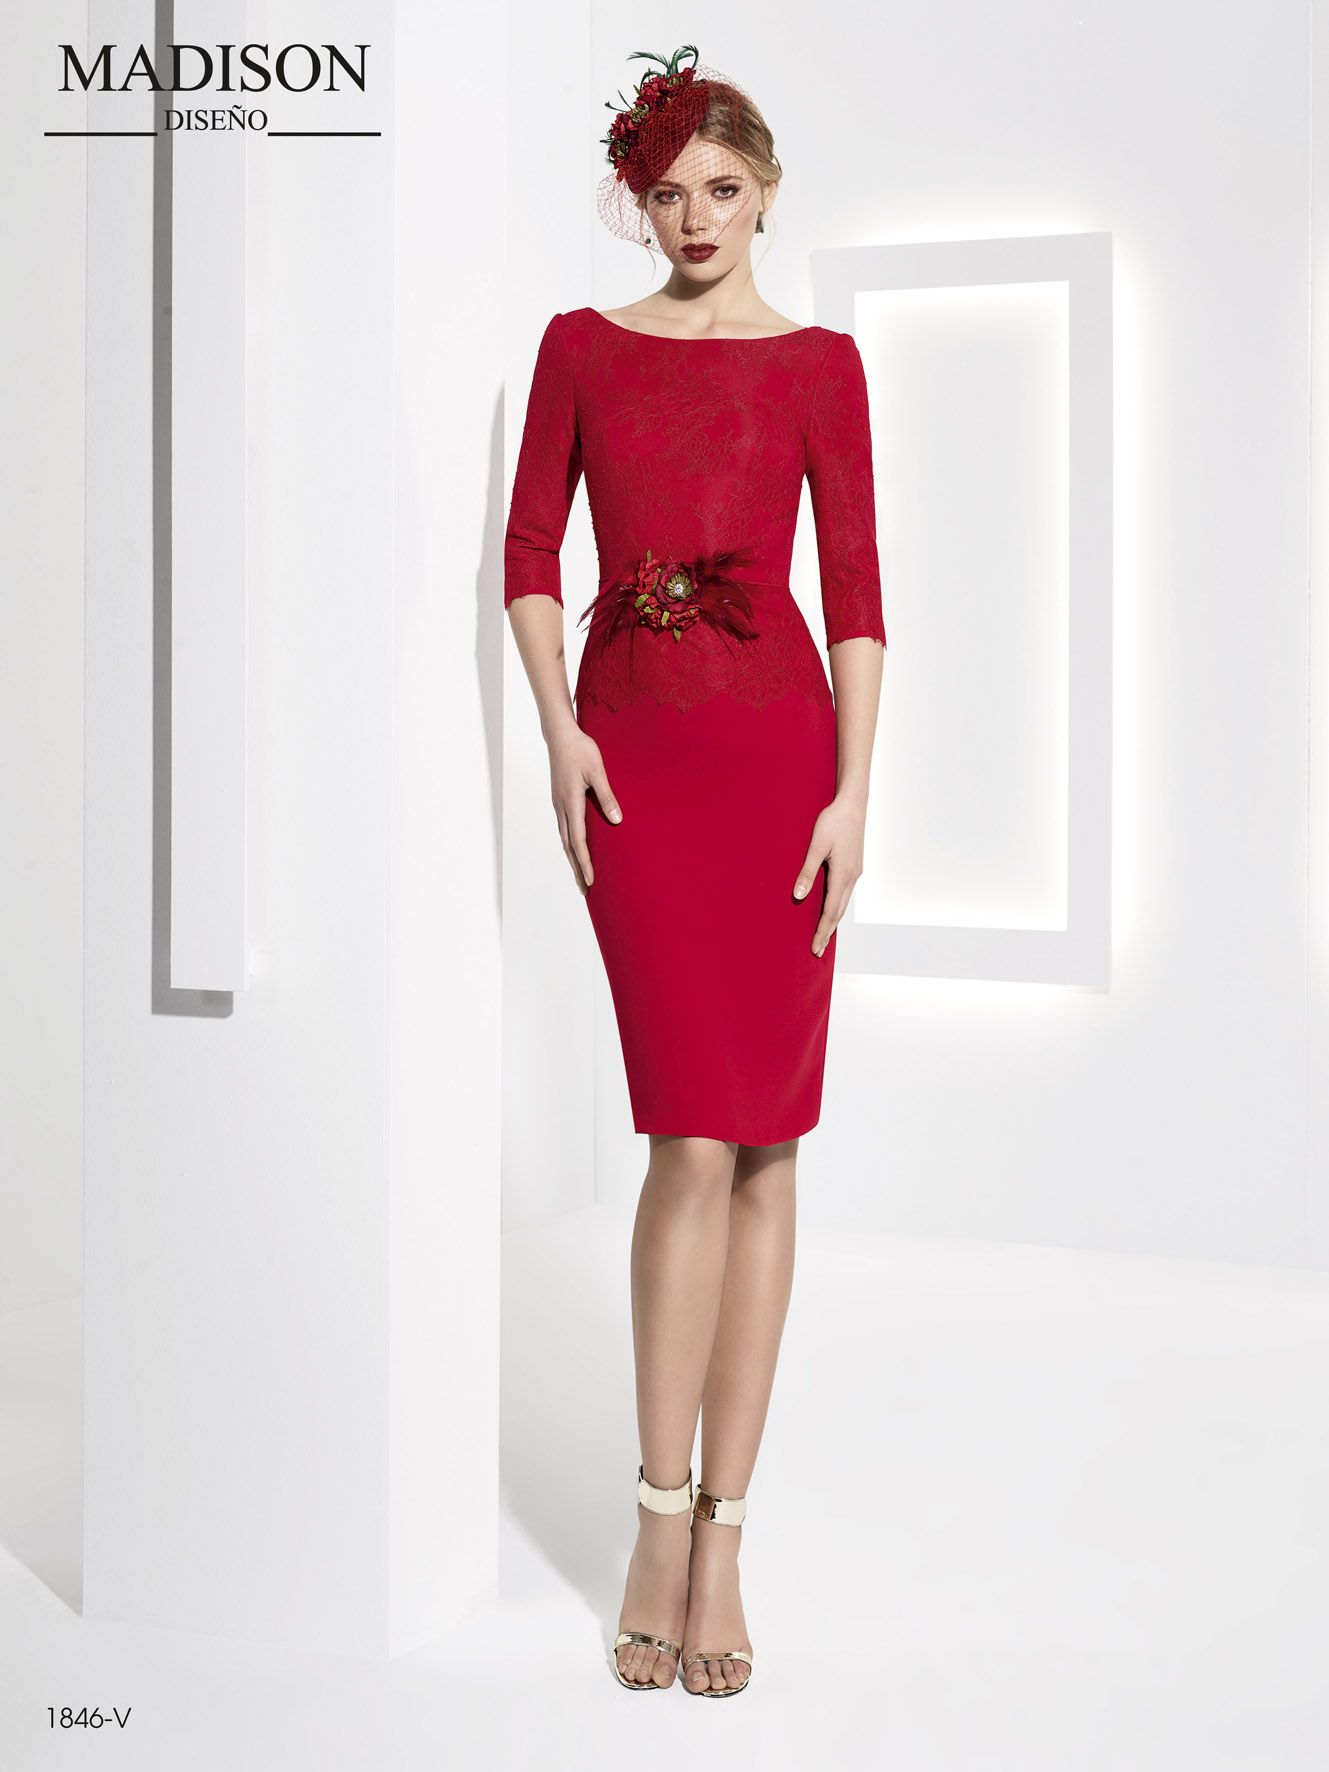 033d4ffa8 vestido de fiesta corto rojo con encaje